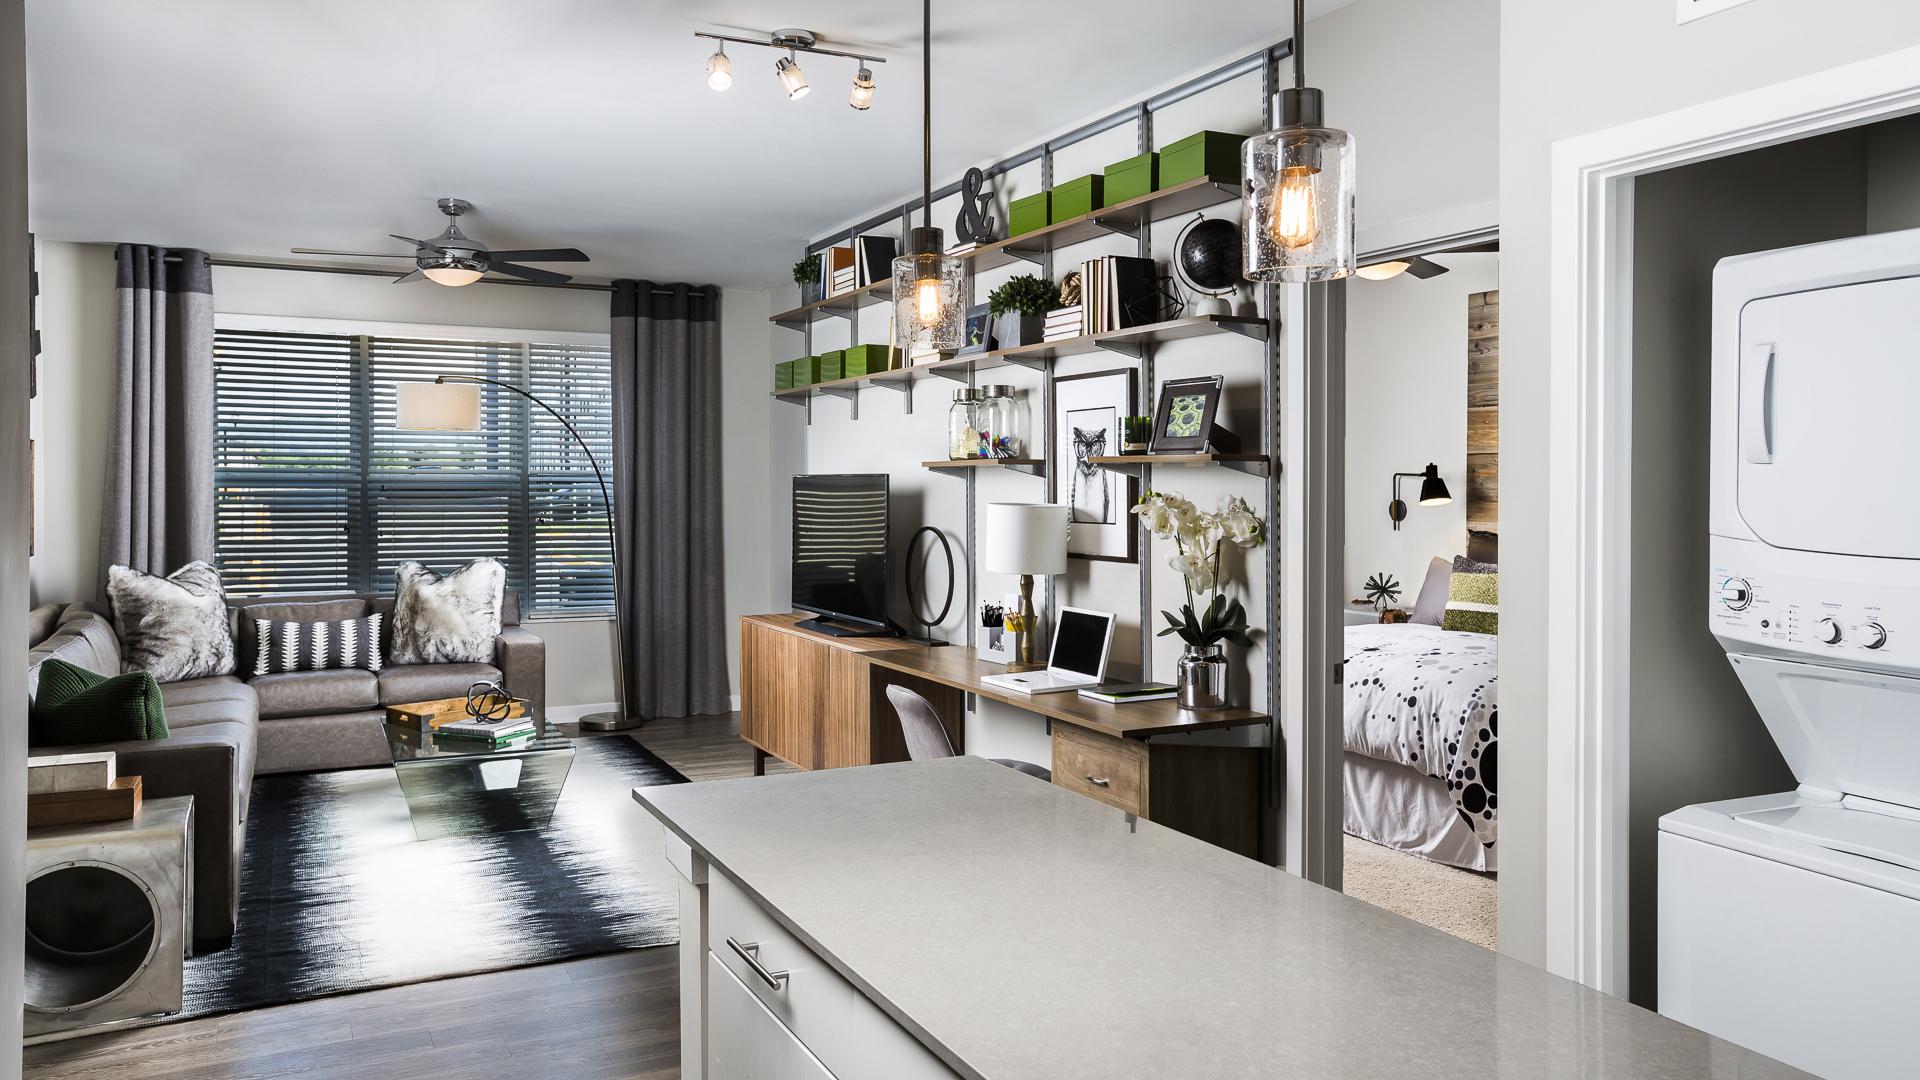 Bainbridge Jefferson Place Brings Unparalleled Luxury Living to